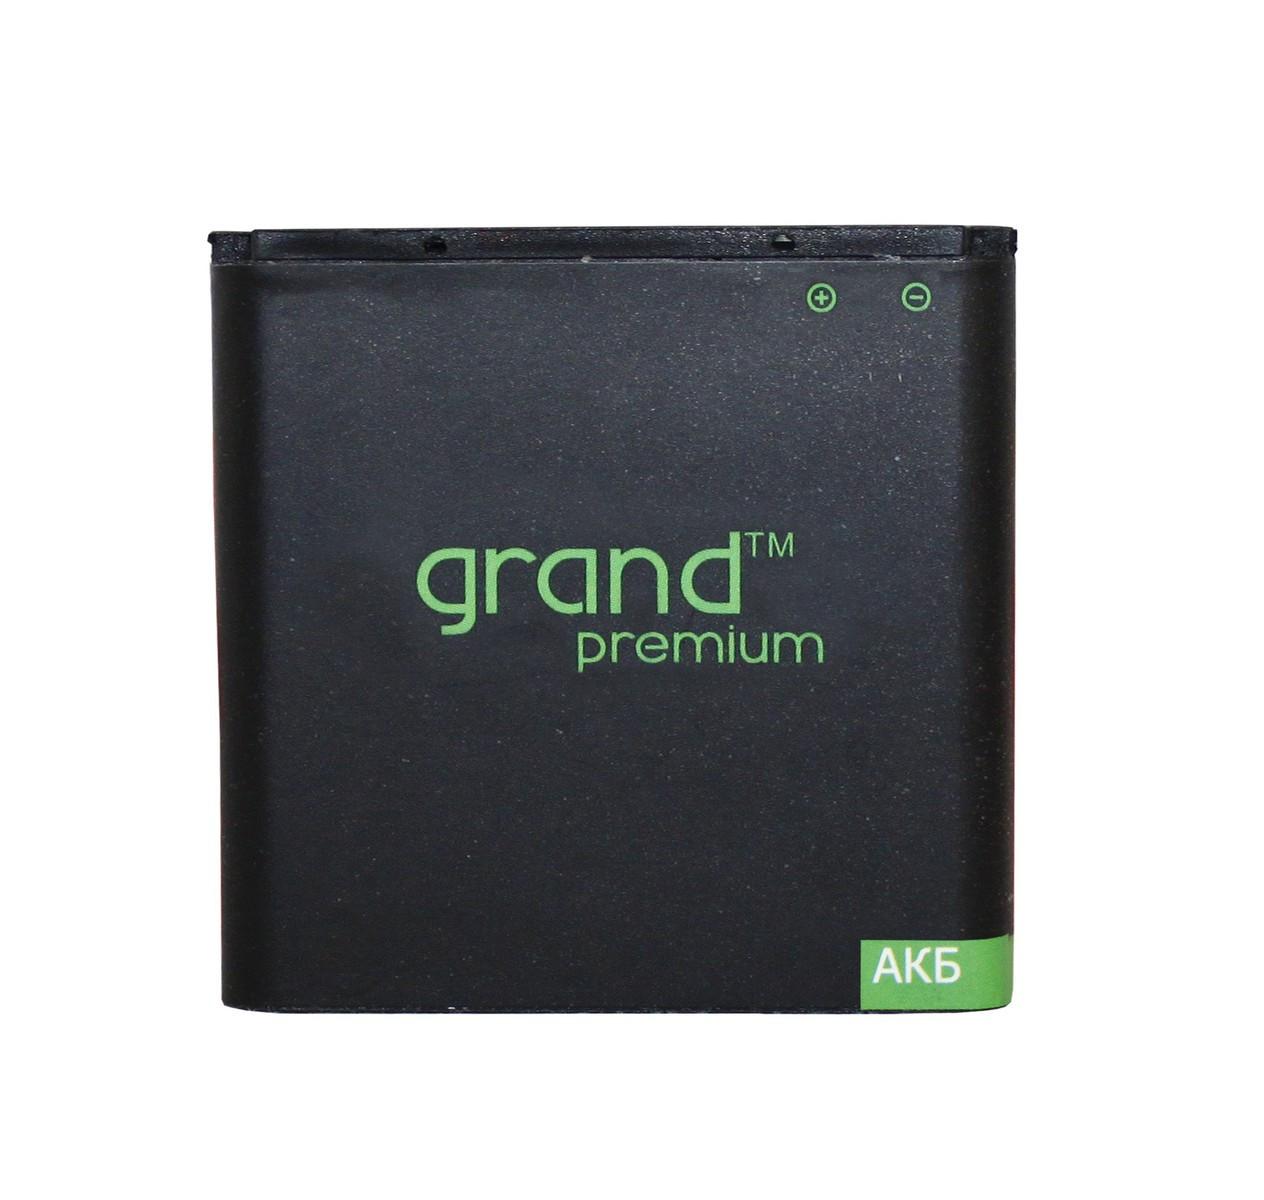 Аккумуляторная батарея GRAND Premium для Fly  BL4253/IQ443 - ChinaWorld - мир больших возможностей! в Харькове